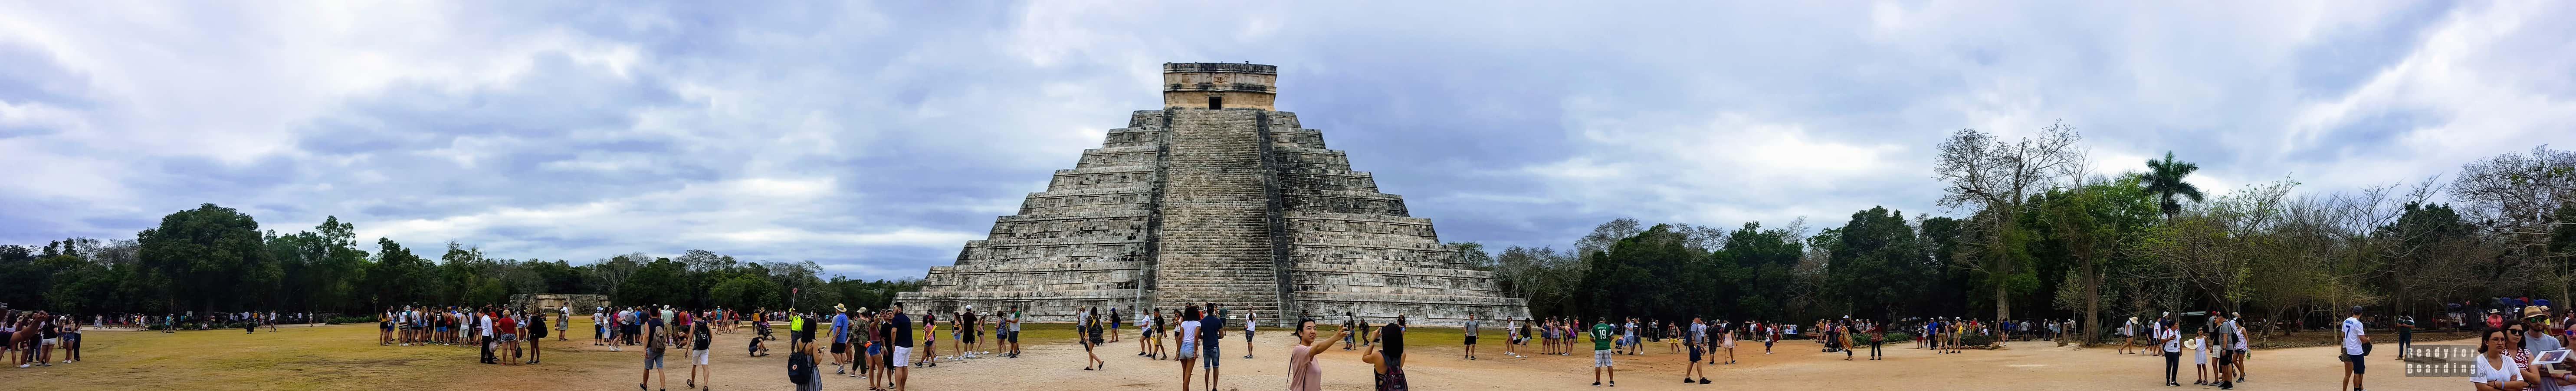 Panorama: Piramida Kukulkana, Chichén Itzá – Meksyk